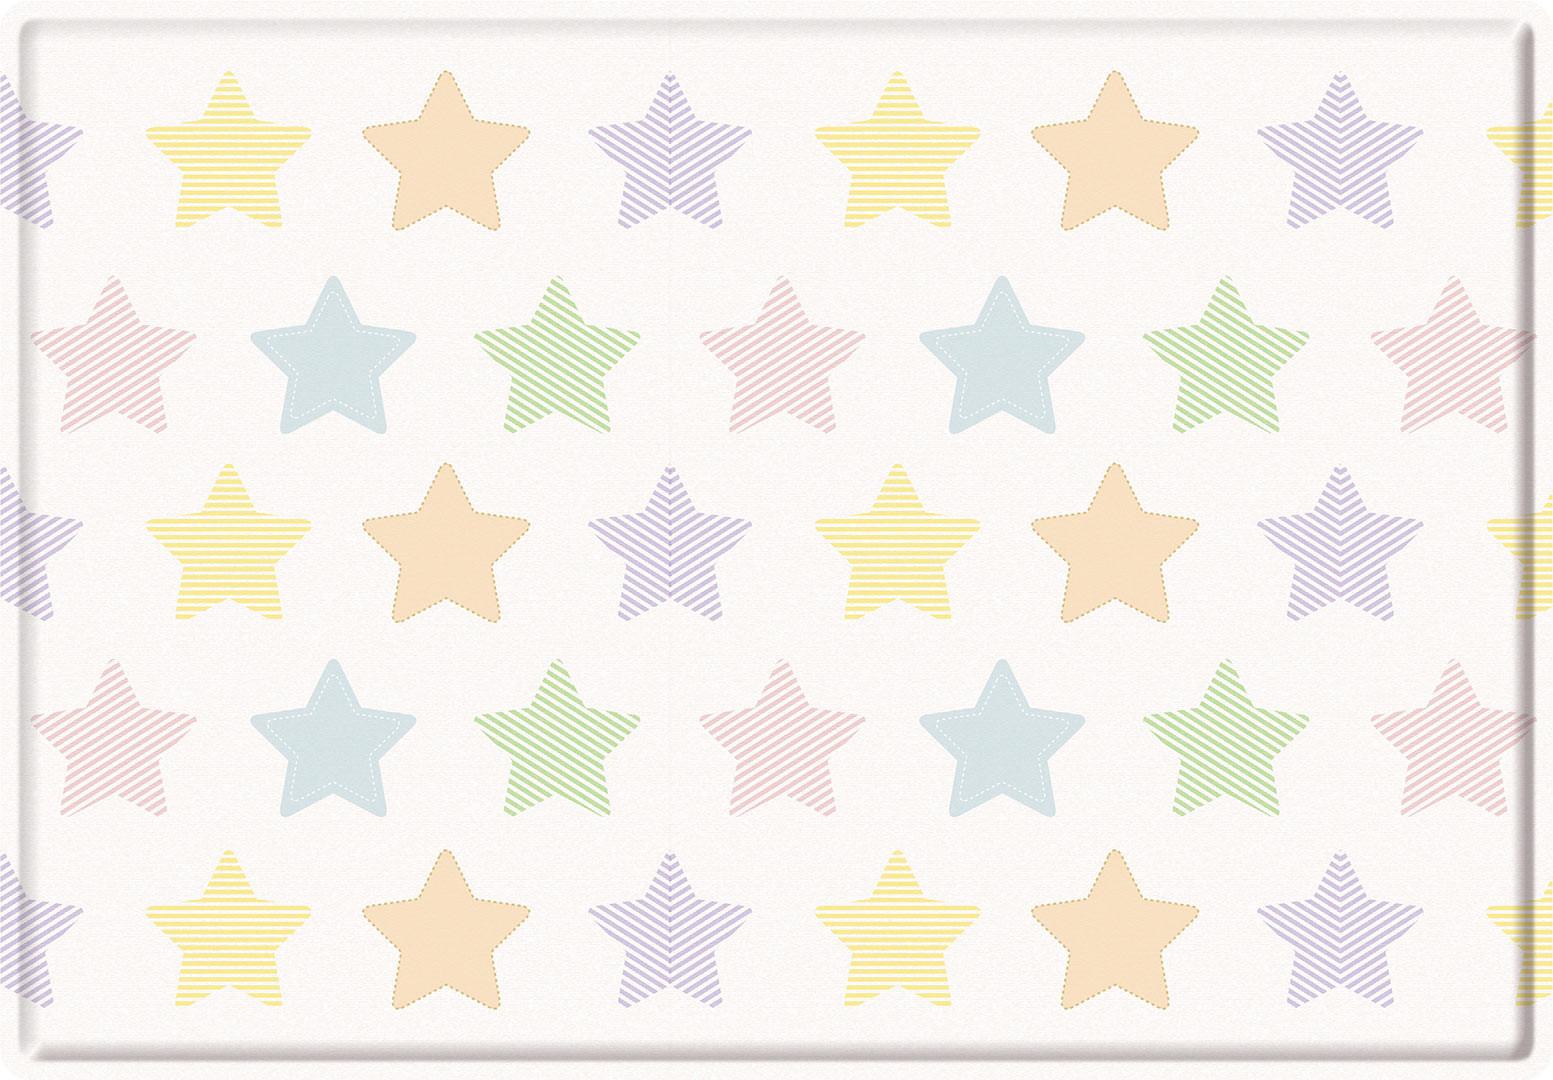 Tapis de jeu enfant multicolore Stars